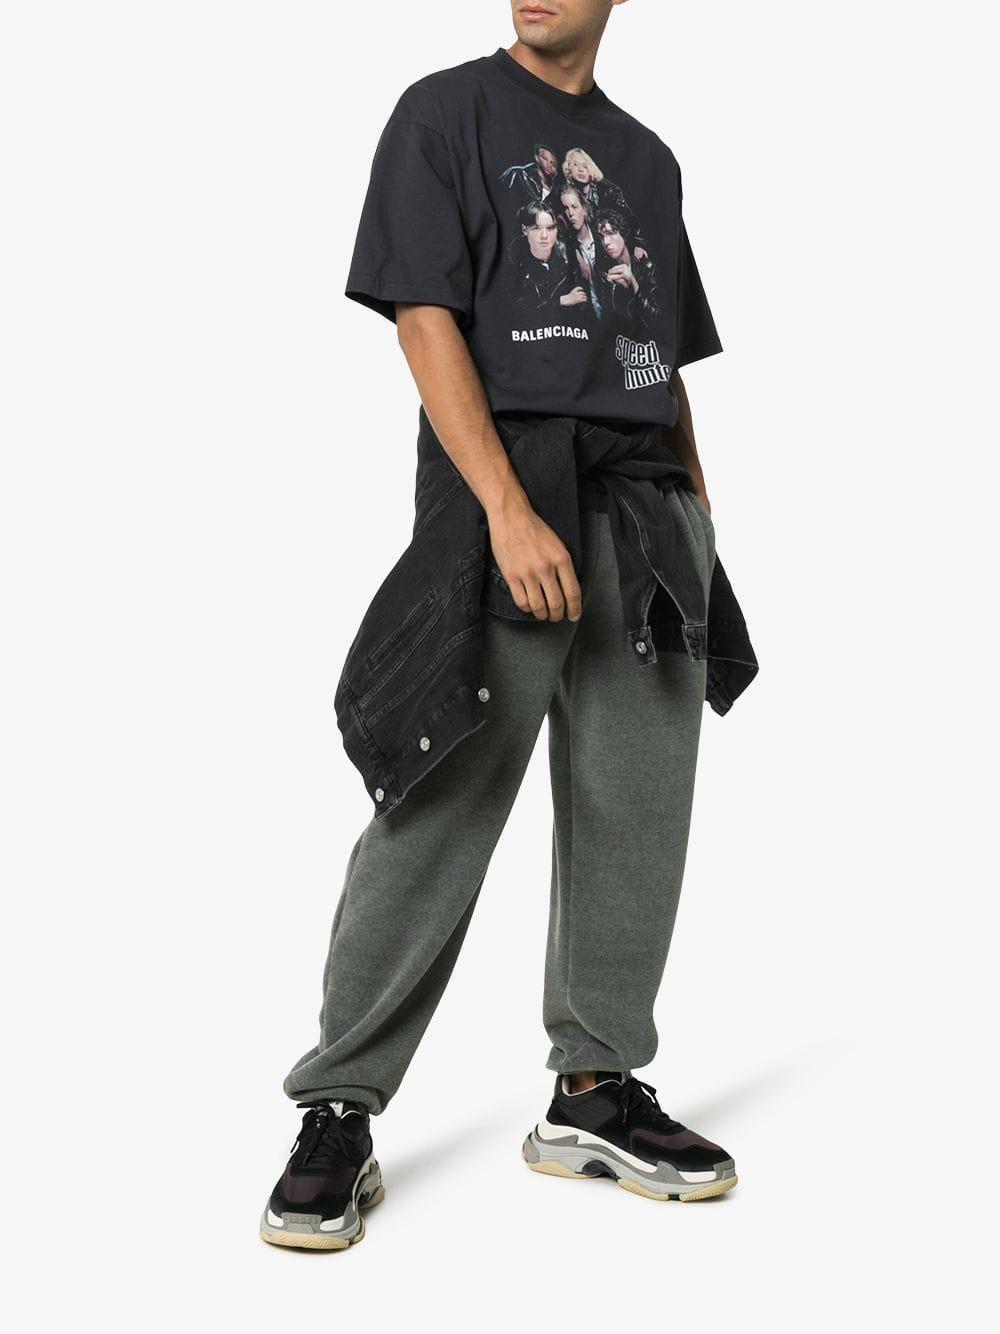 d881d48fc62e Lyst - Balenciaga Speedhunter T-shirt in Black for Men - Save 40%